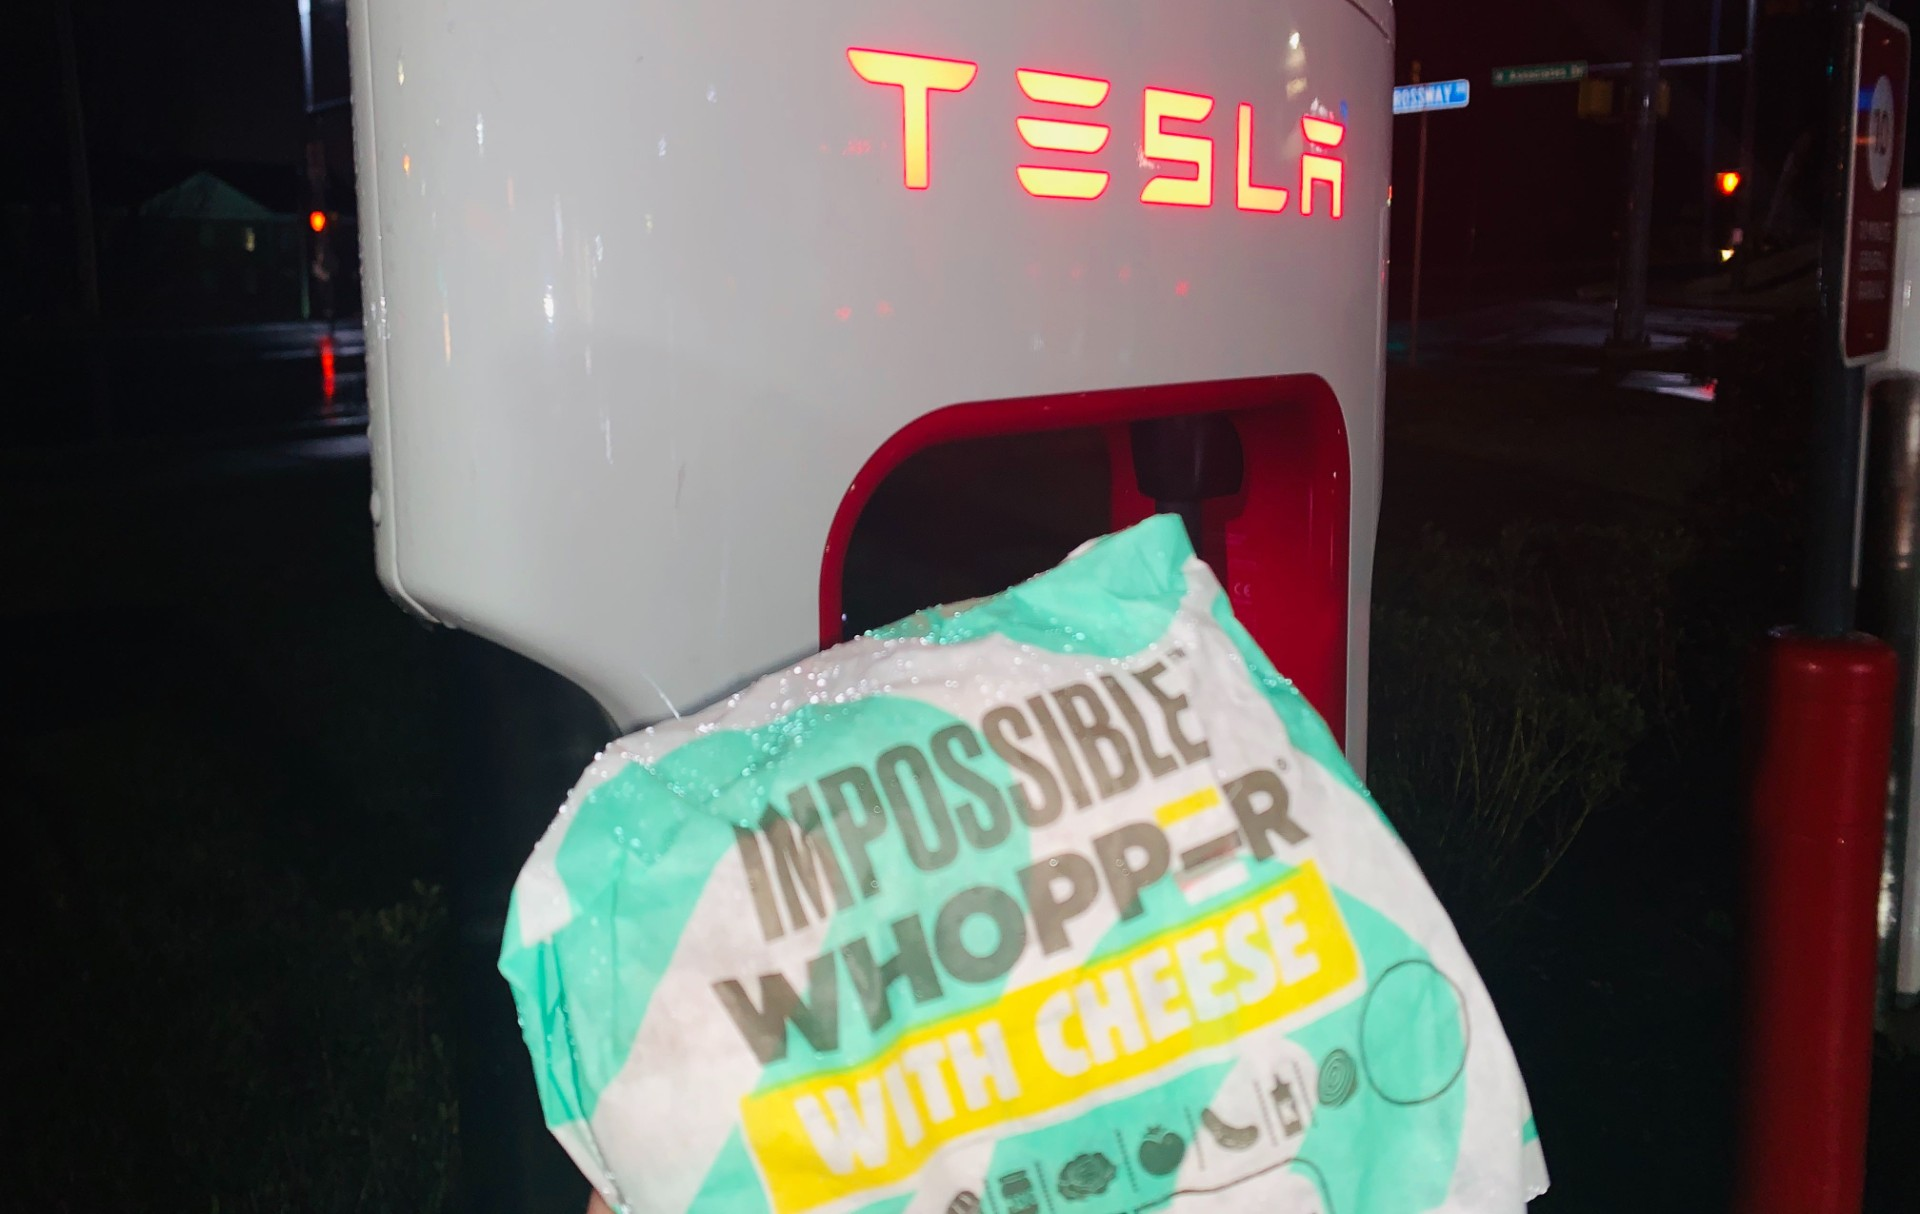 tesla-supercharger-impossible-whopper-bk-1-crop